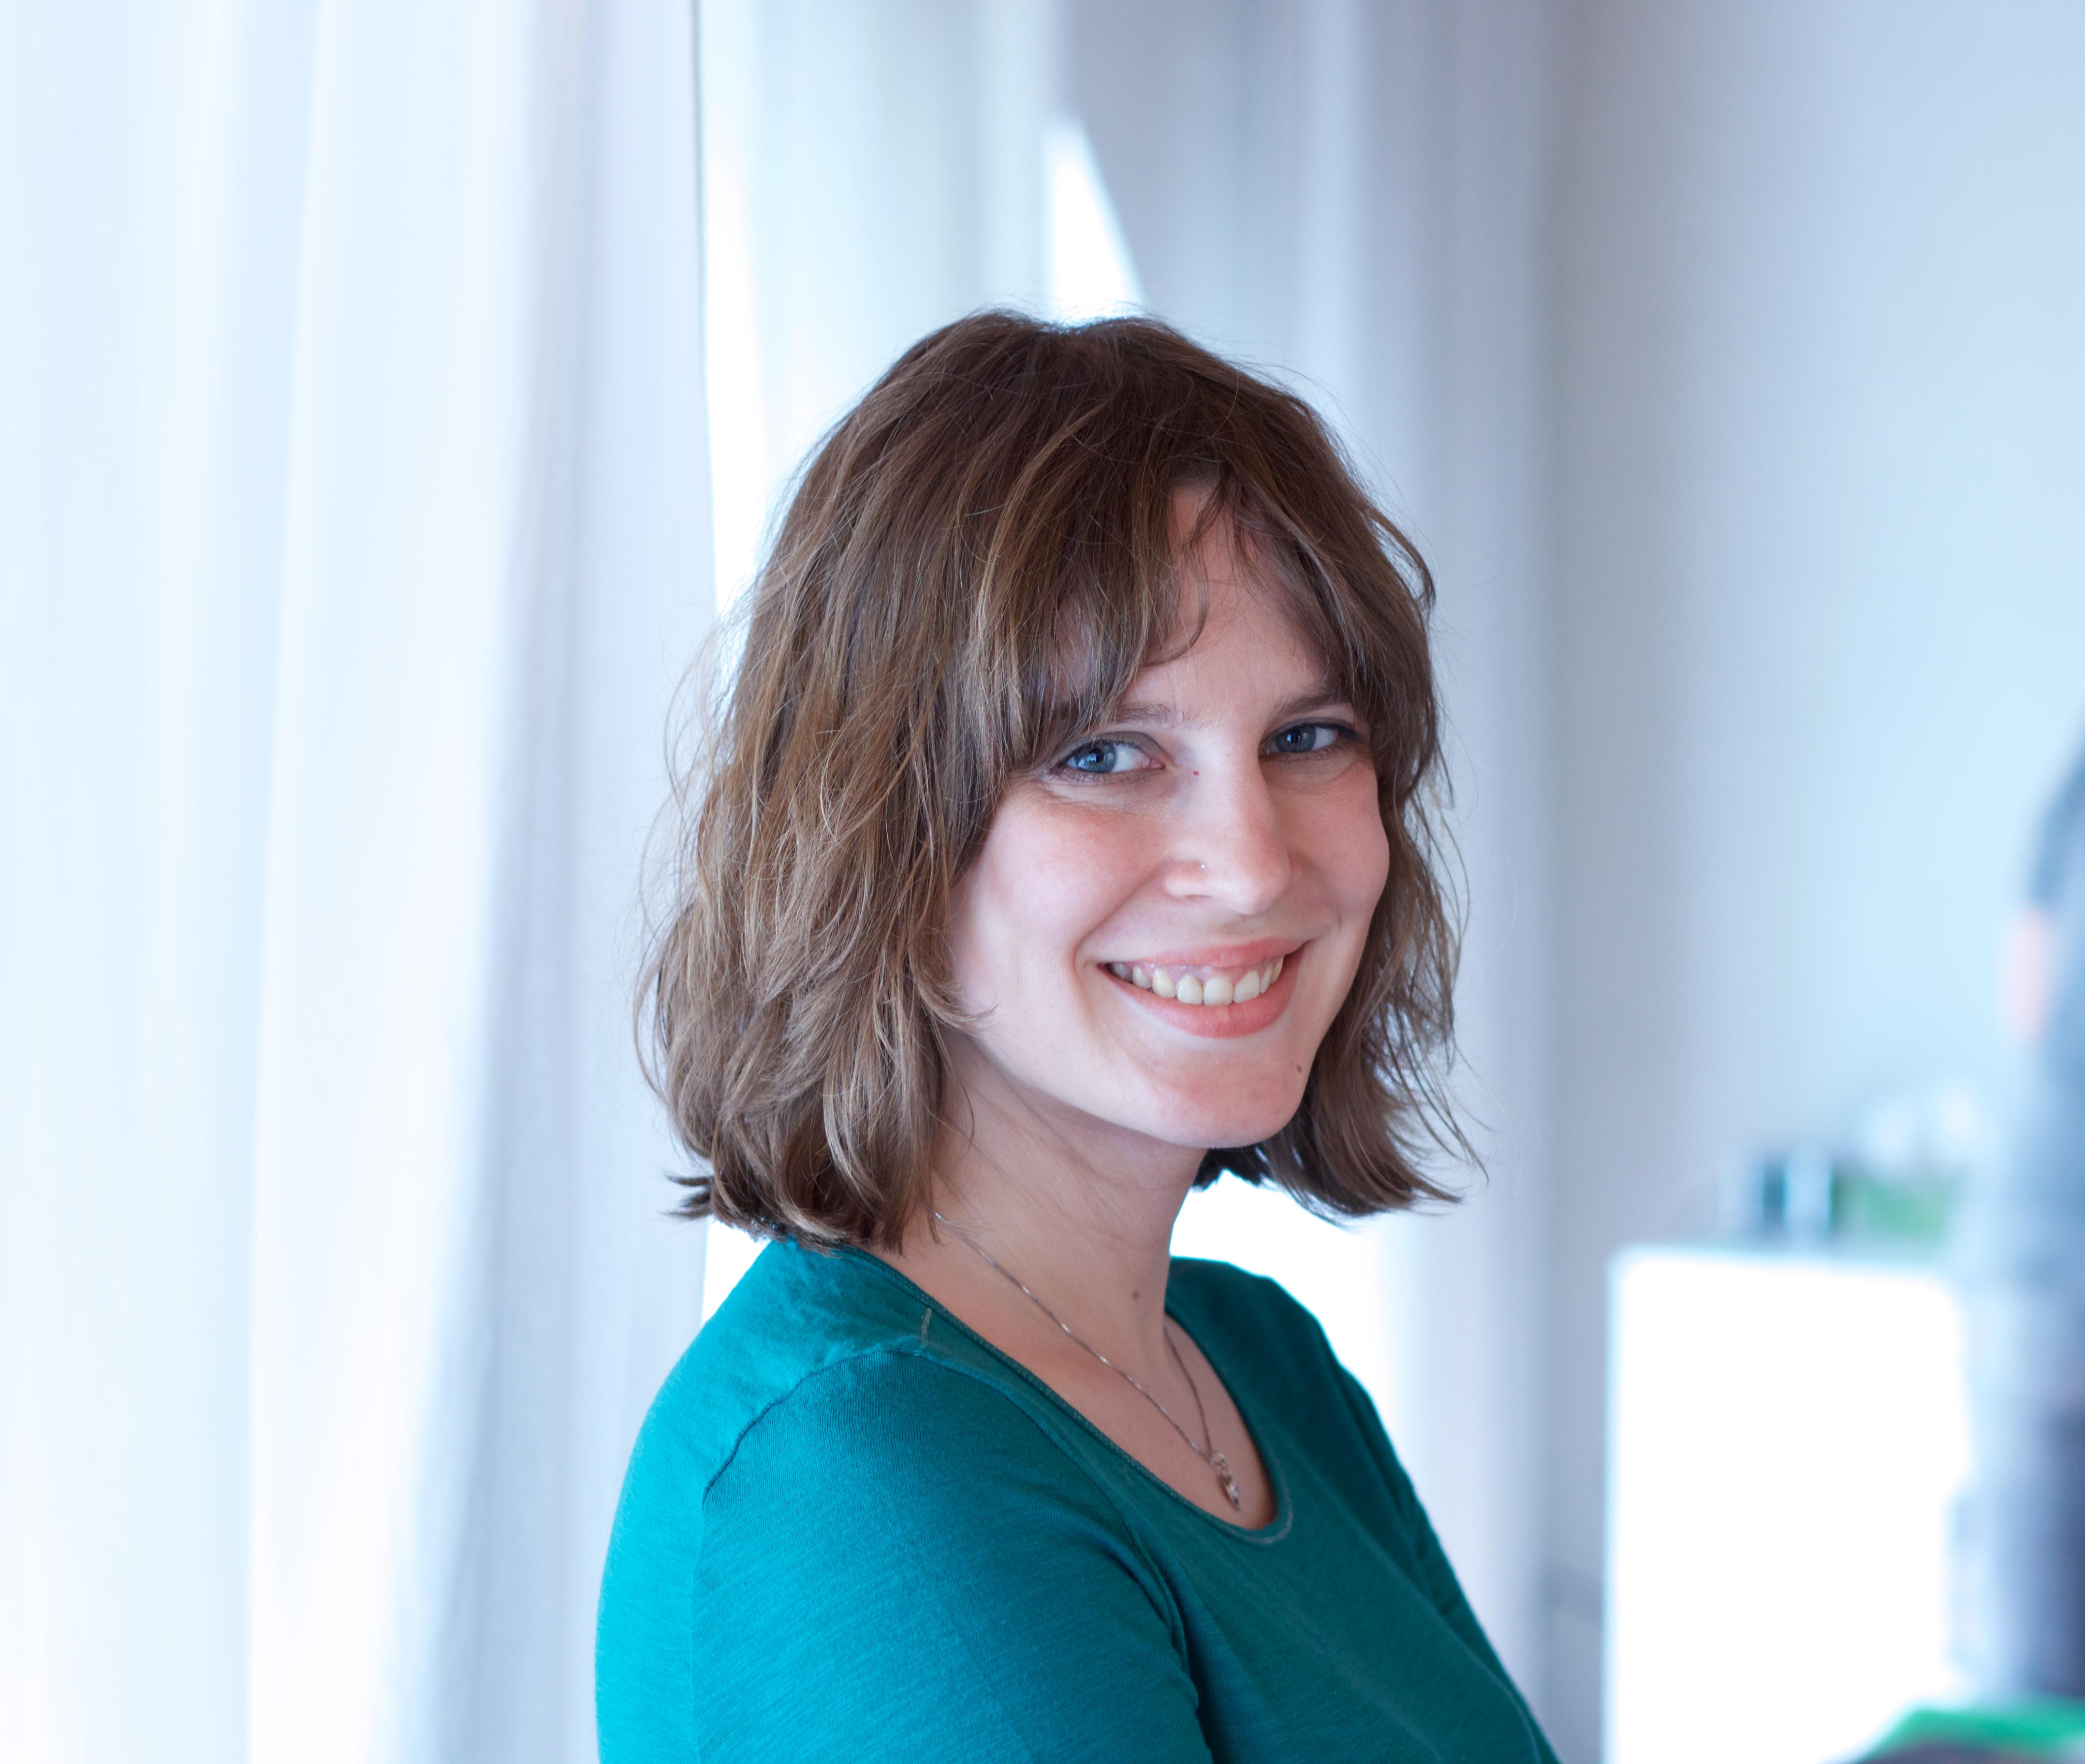 Porträt von Nina Vöhringer, Naturheilpraktikerin